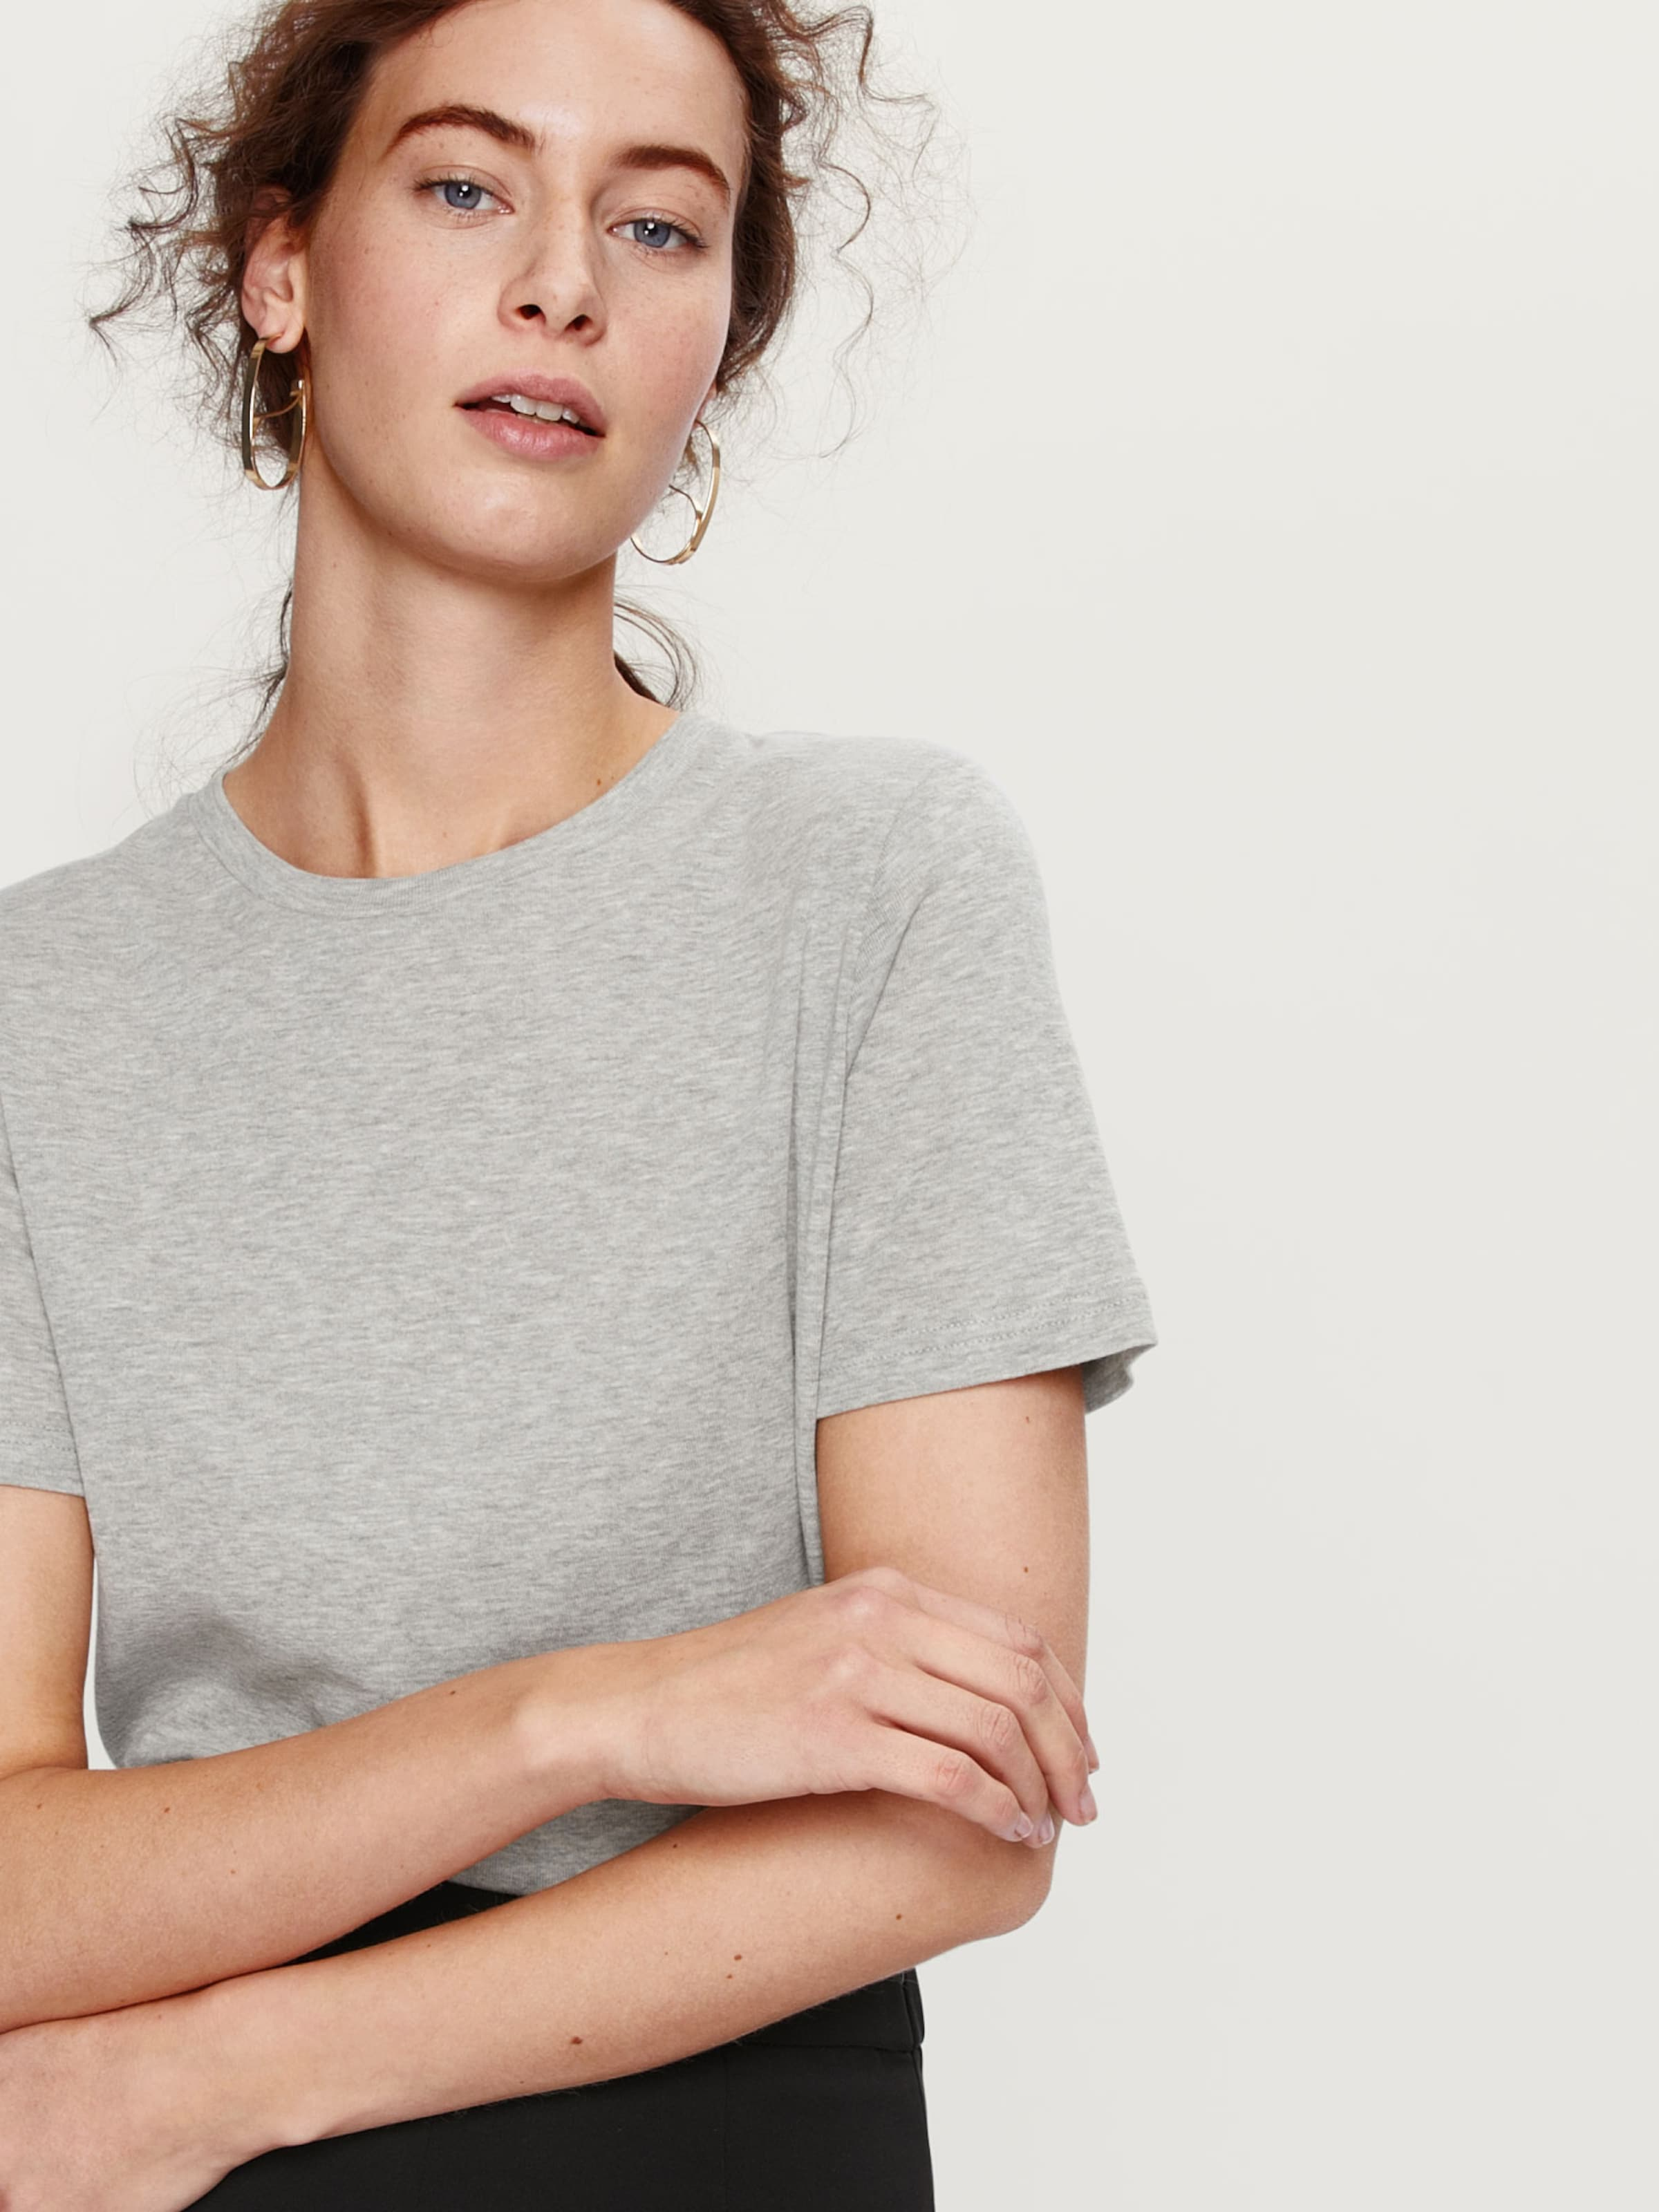 Edited Grau T 'patricia' In shirt UVMpSz